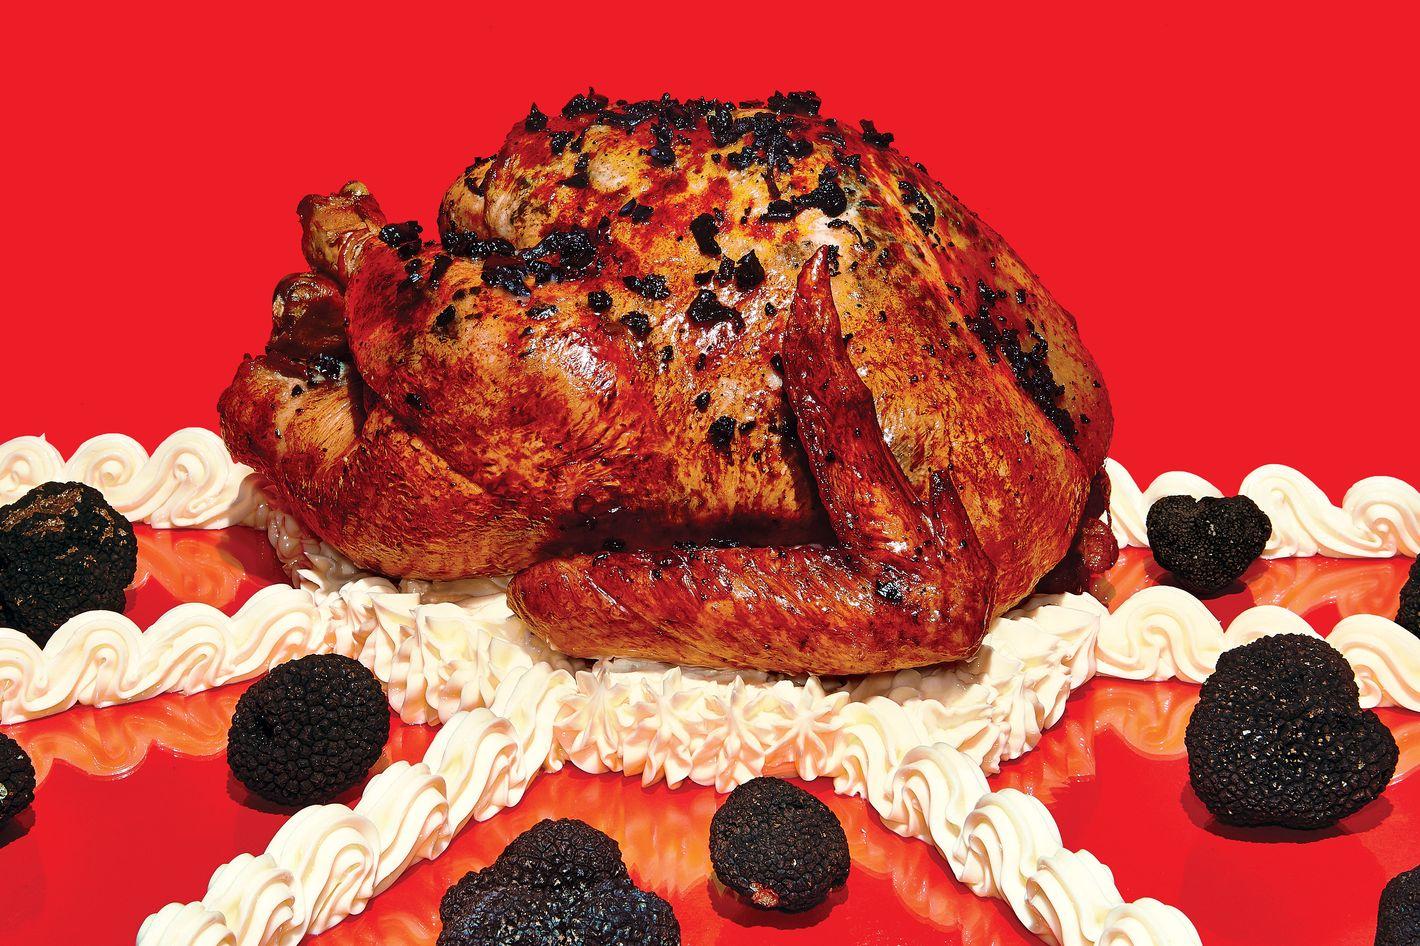 http://pixel.nymag.com/imgs/daily/grub/2013/11/08/magazine/07-holiday-food-turkey.jpg